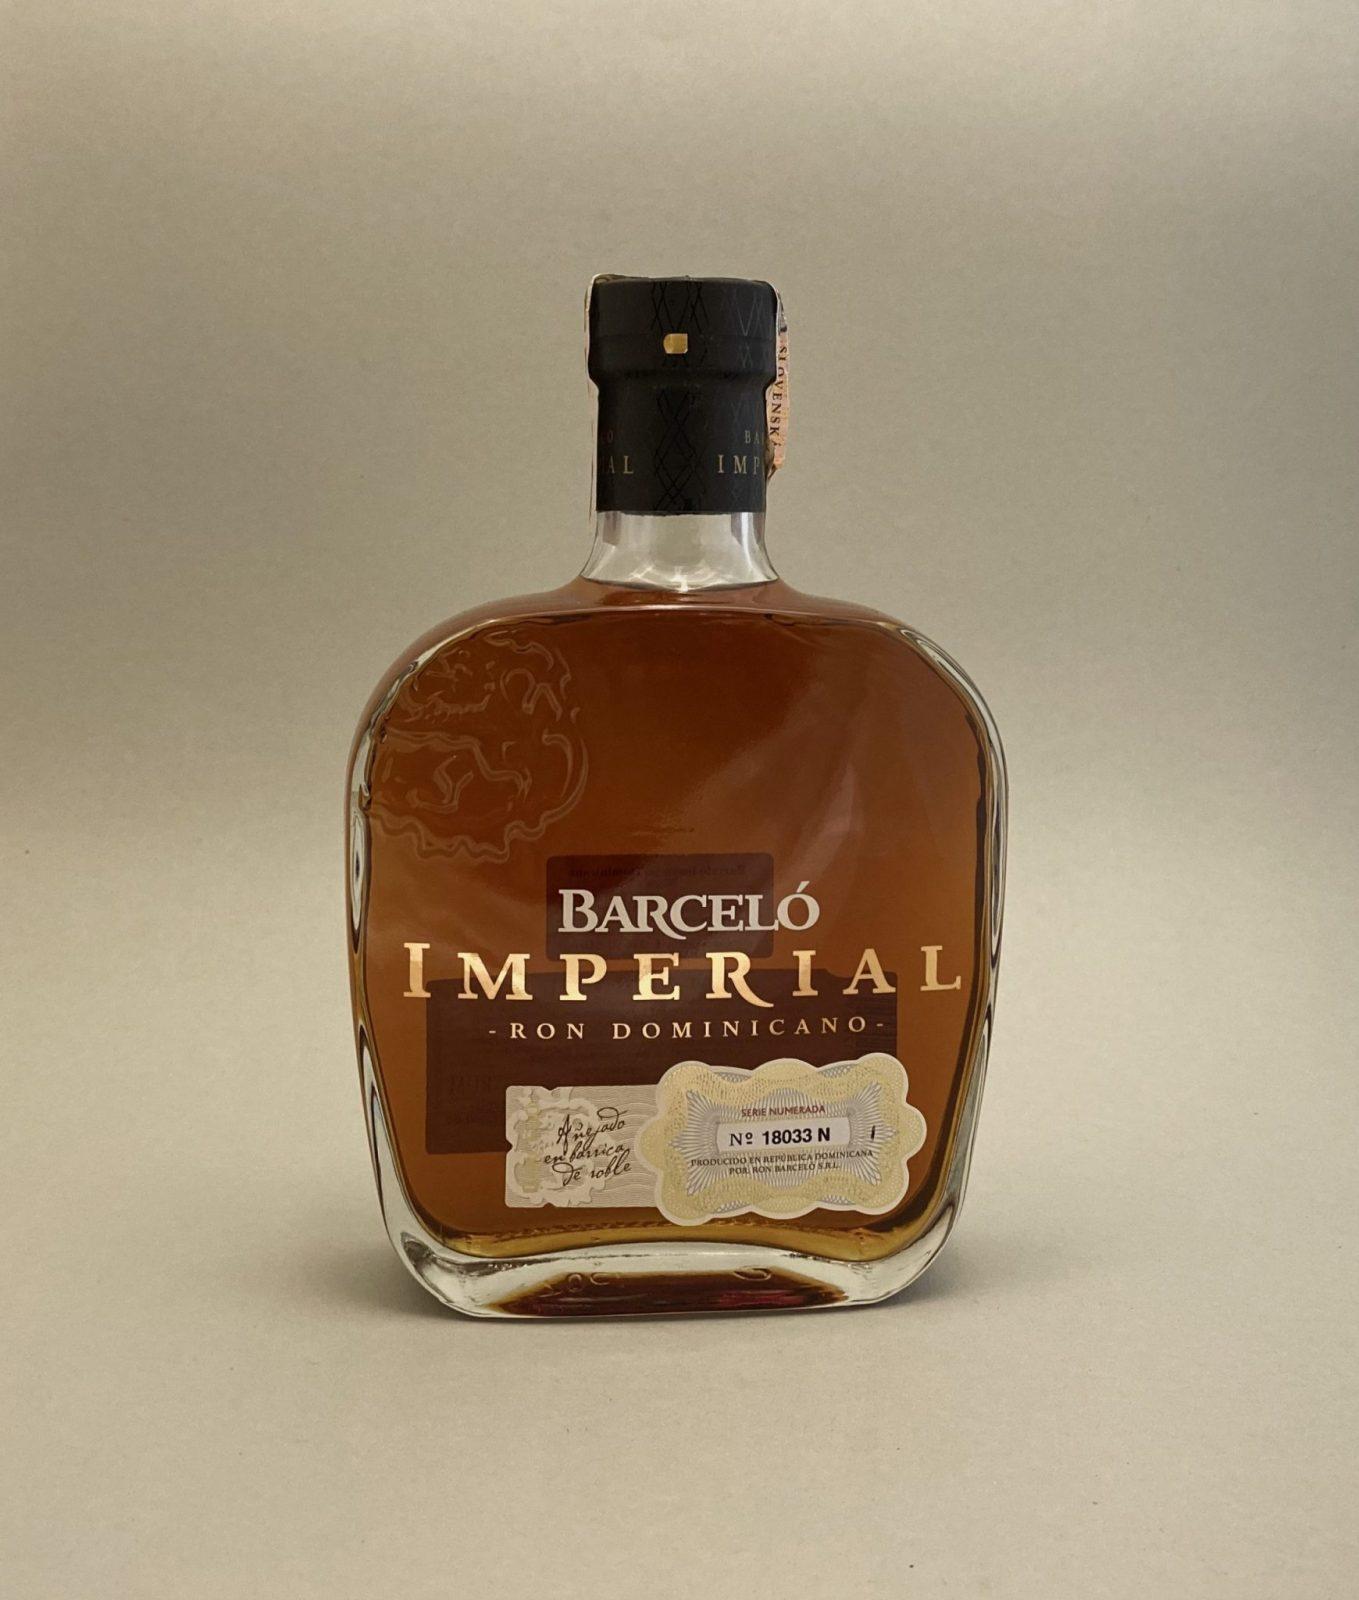 Barceló Imperial 38%, Bottleshop Sunny wines slnecnice mesto, petrzalka, rum, rumy, rozvoz alkoholu, eshop